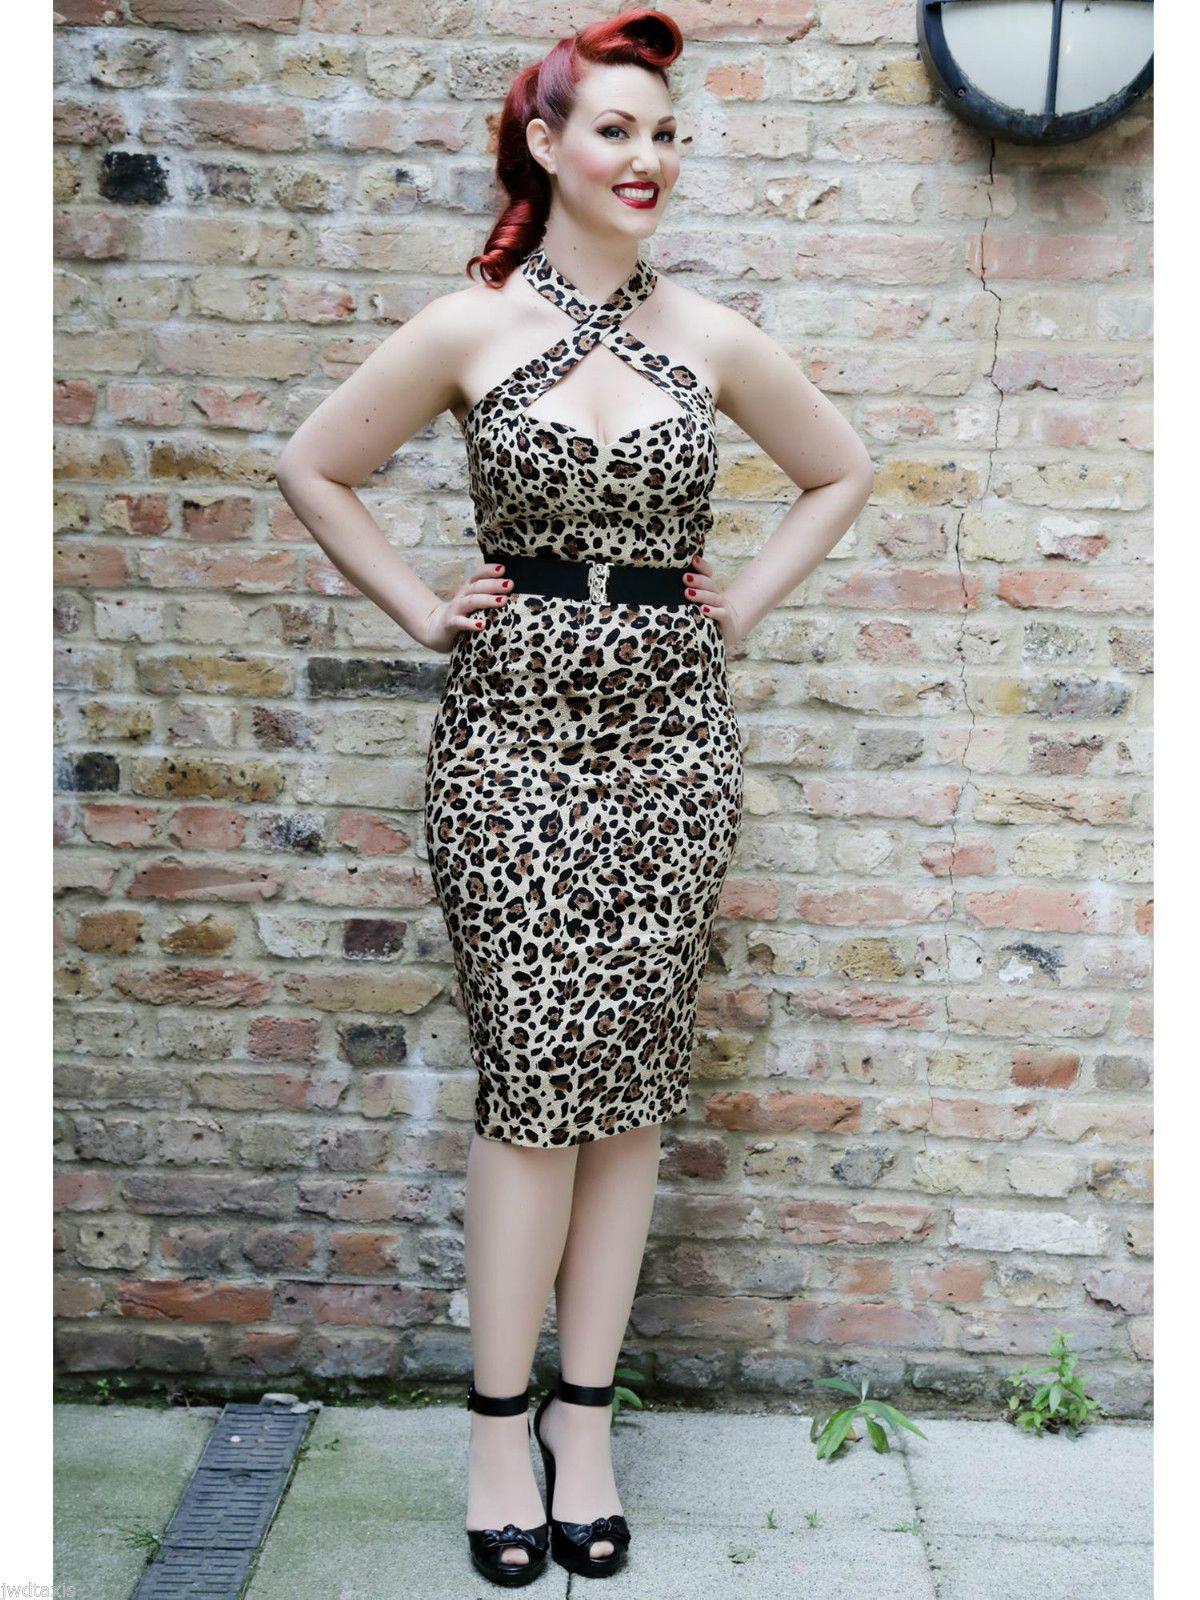 b8b77cd0b30 Collectif Penny Leopard 50s Pin Up Rockabilly Pencil Dress 10 12 14 16 18  20 22